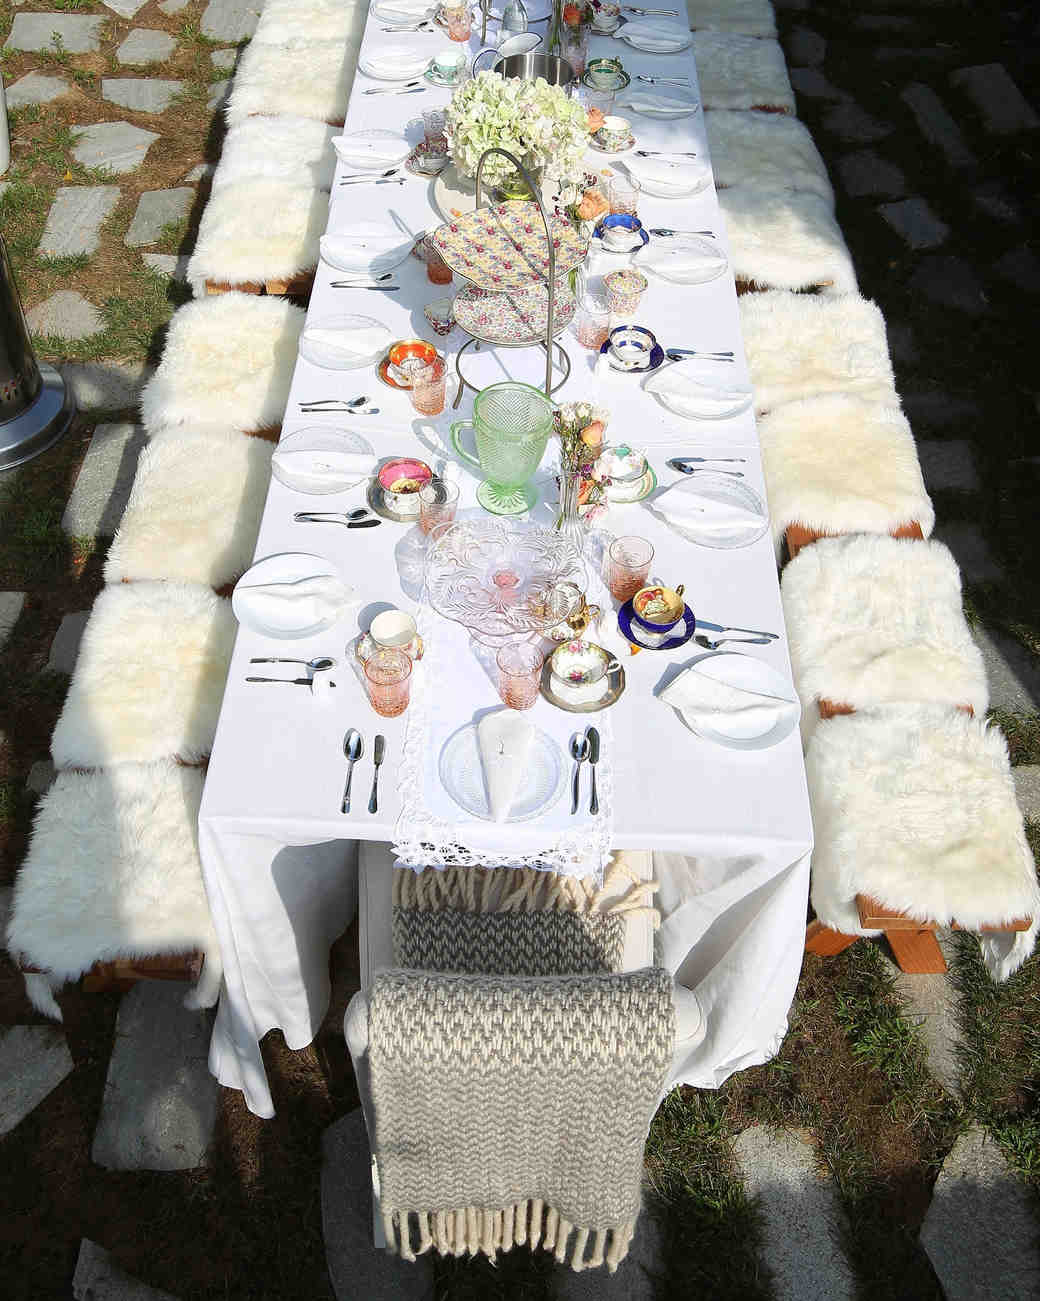 geri-hirsch-bridal-shower-tea-party-tablescape-0315.jpg